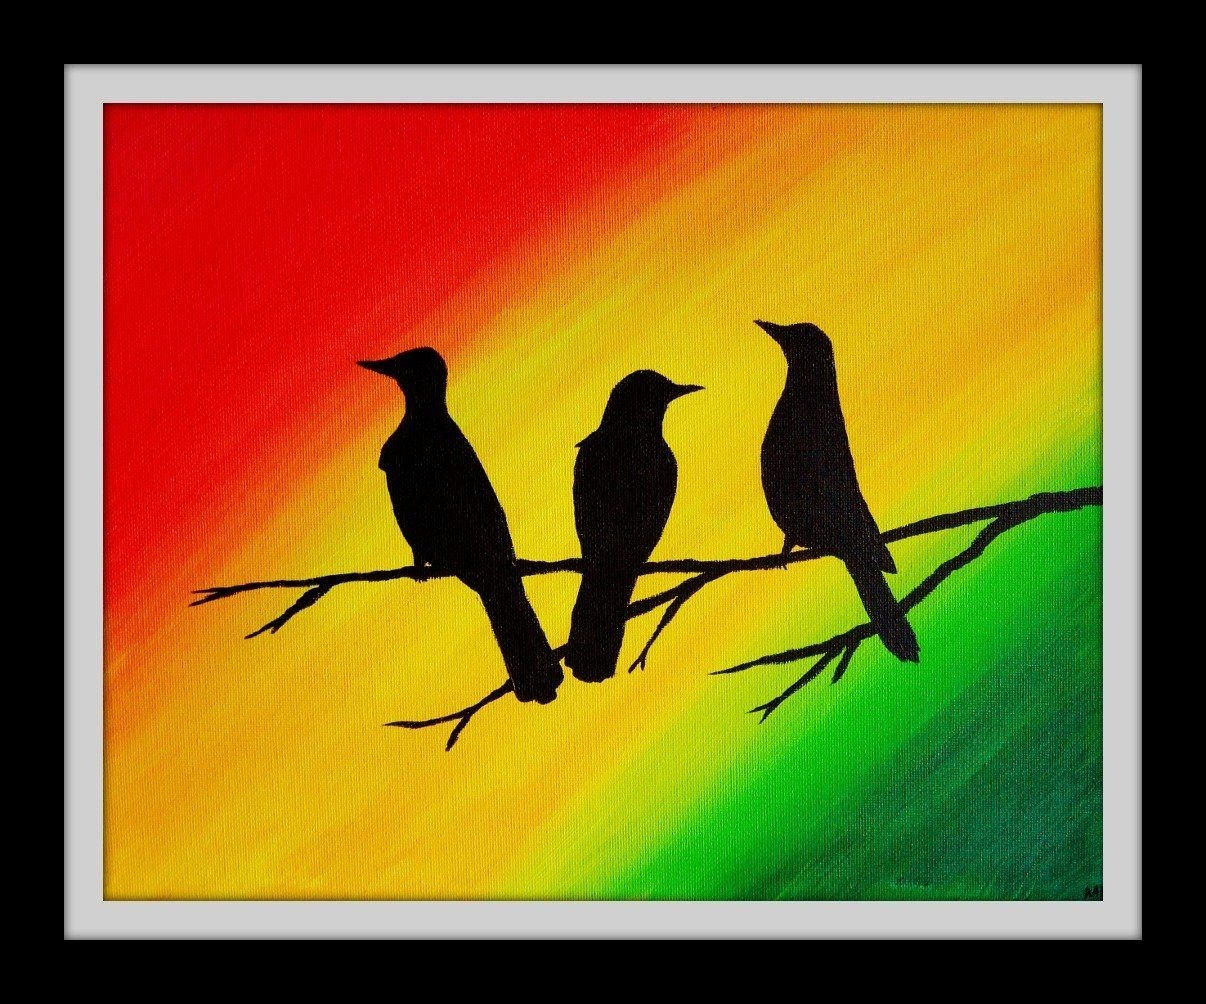 Three Little Birds Wall Art Rasta Decor | crafts for mommy ...